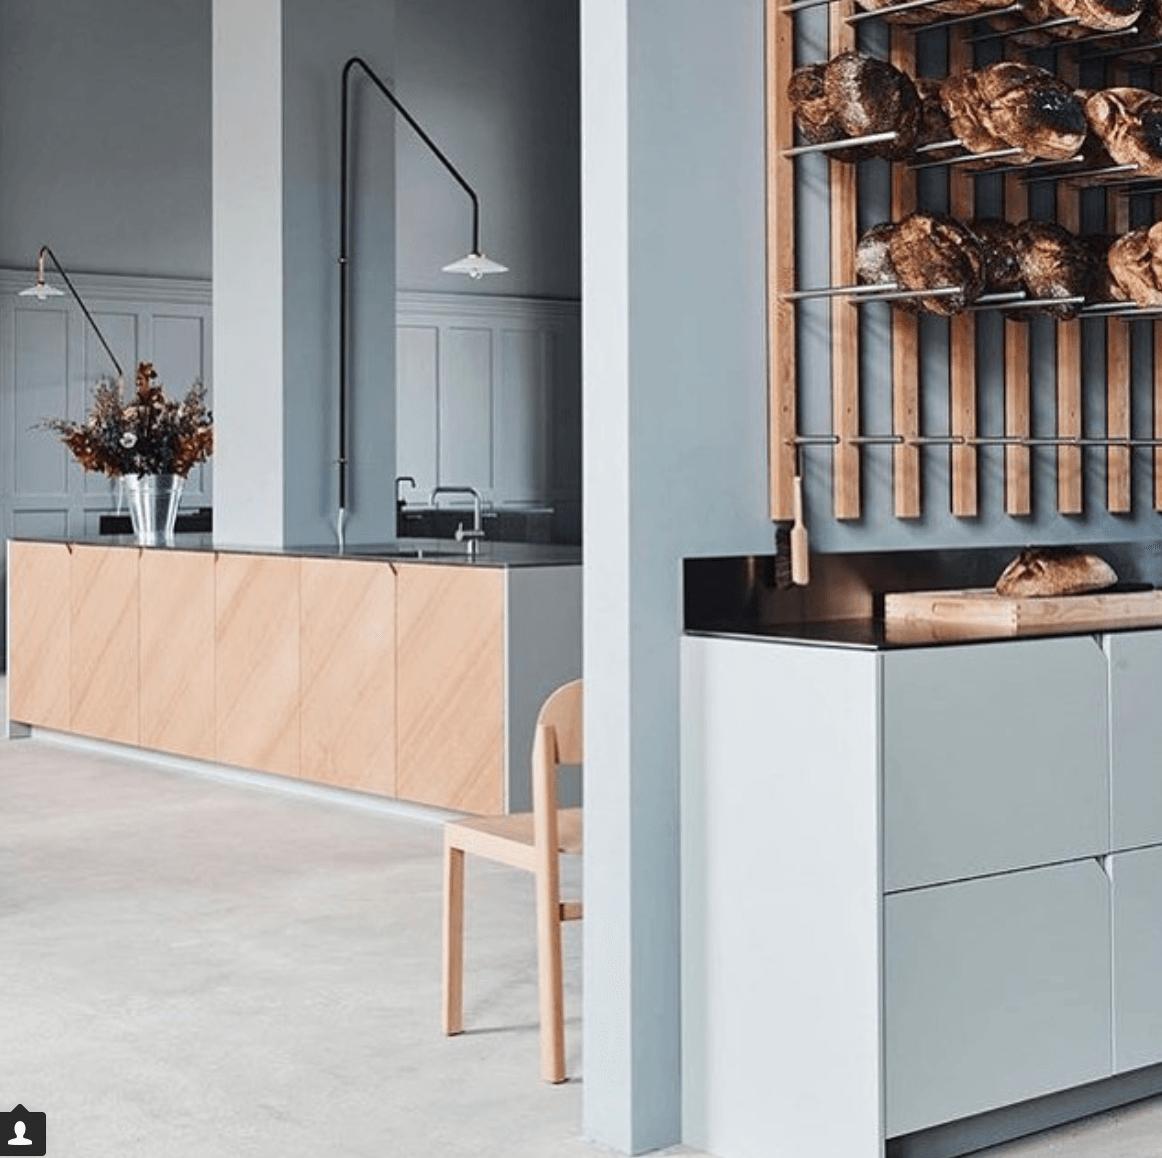 interieur-interior-lichtblauw-light blue-houten schrijnwerk-lichte eik-light oak-wooden joinery-keuken-kitchen-muller van severen